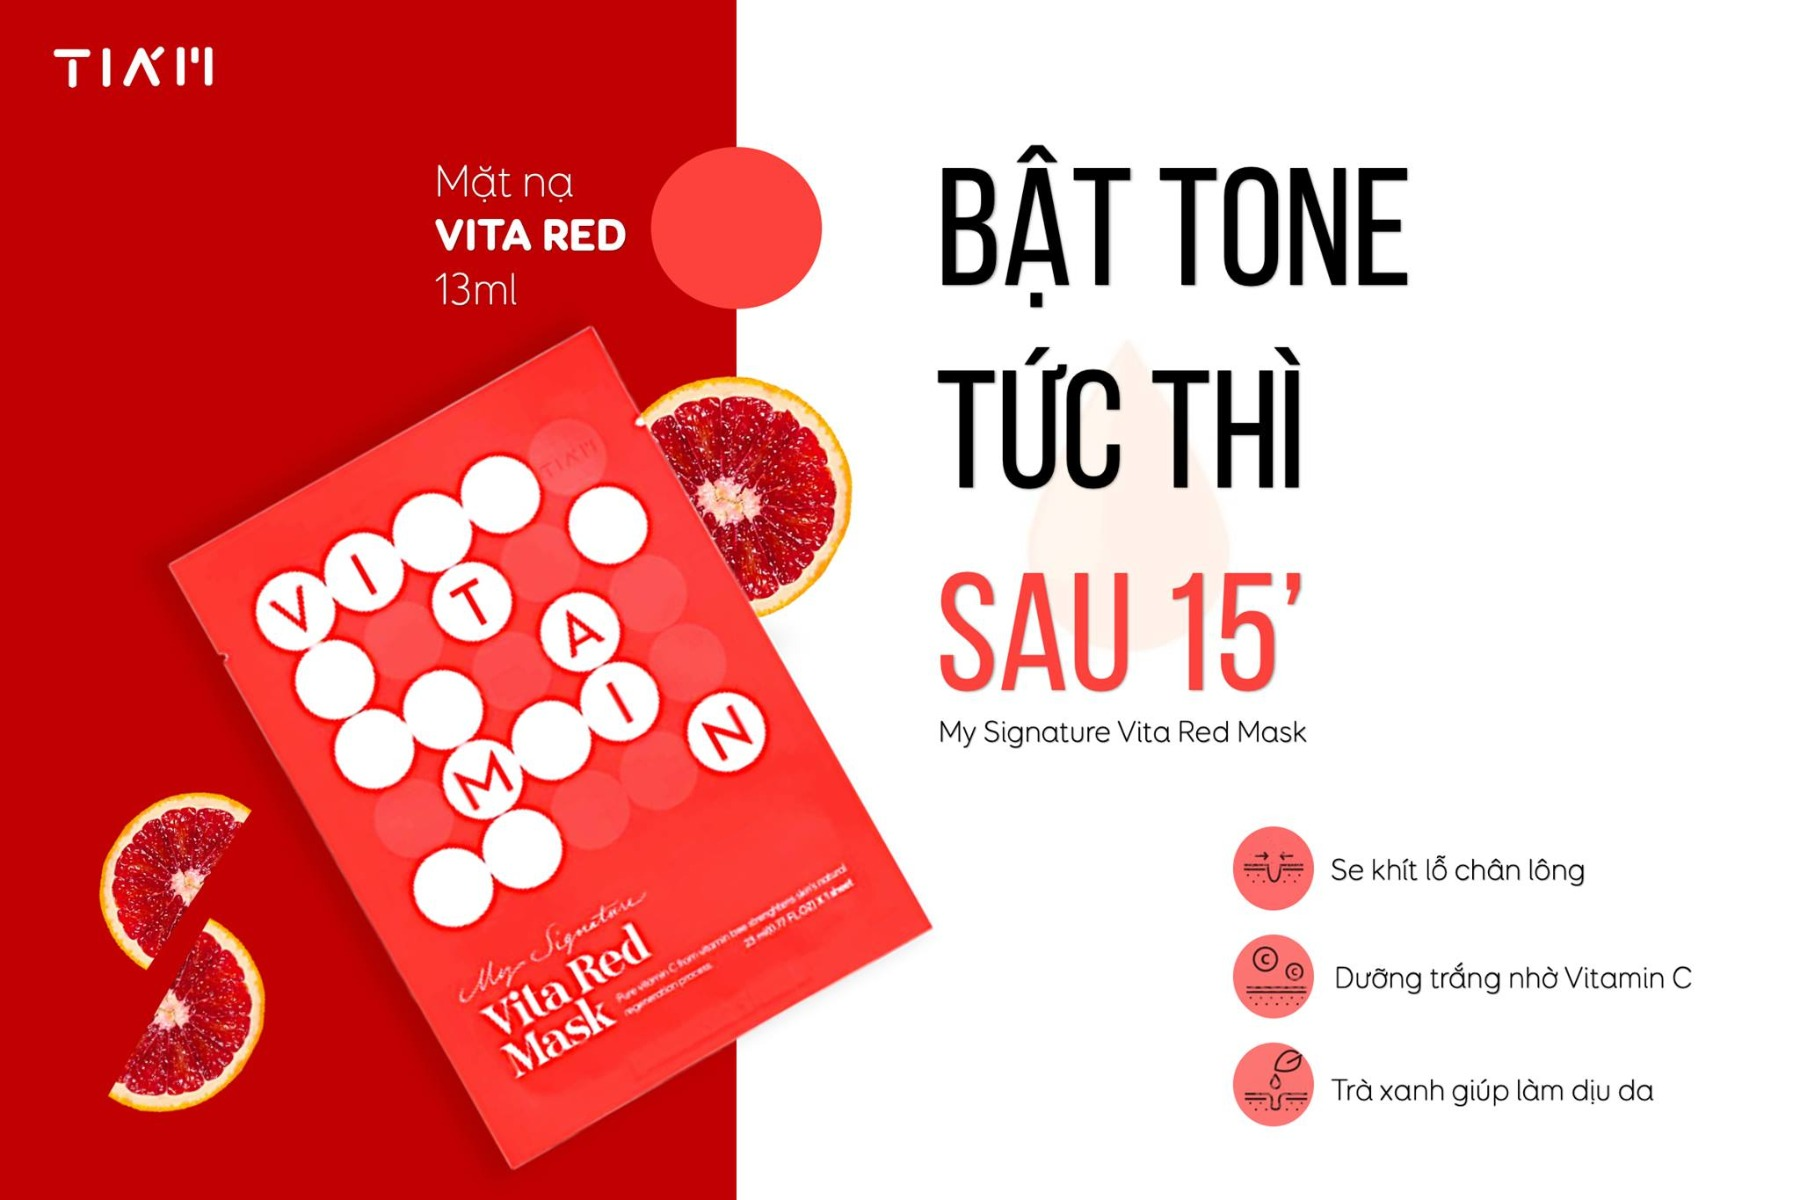 Mặt Nạ Vitamin C Dưỡng Trắng Tiam My Signature Vita Red Mask 23ml